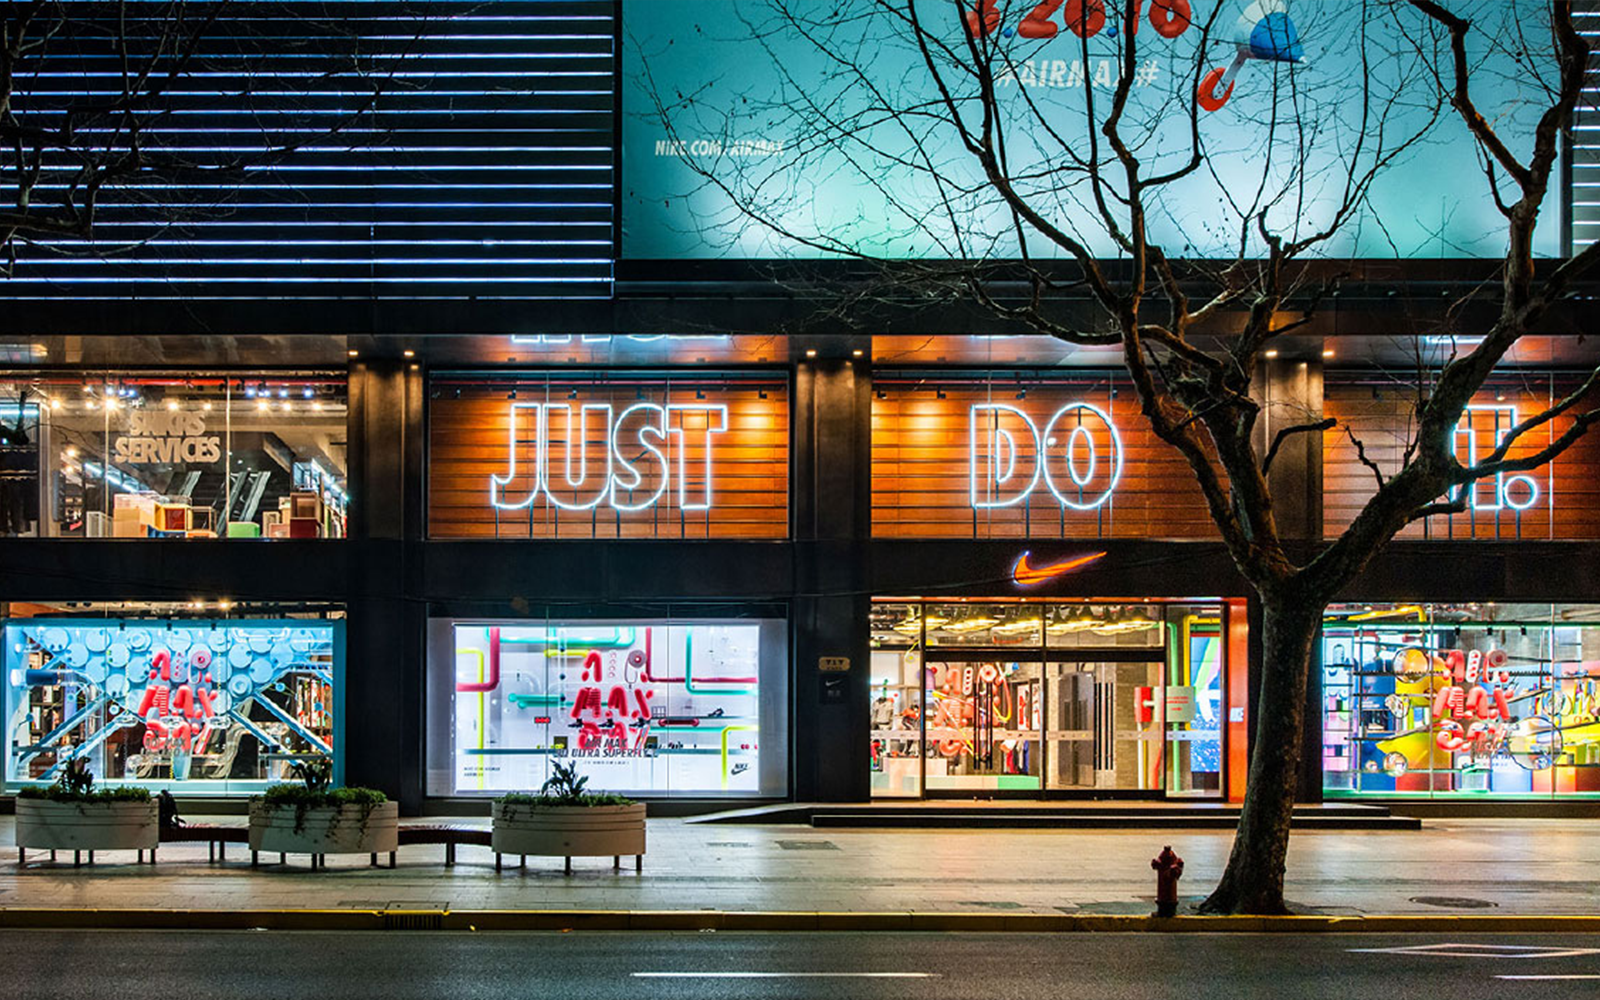 Warby Parker 和酸奶棒 Clio Snacks 获融资;DTC 战略加速,耐克与 9 家零售商终止合作 | 品牌日报